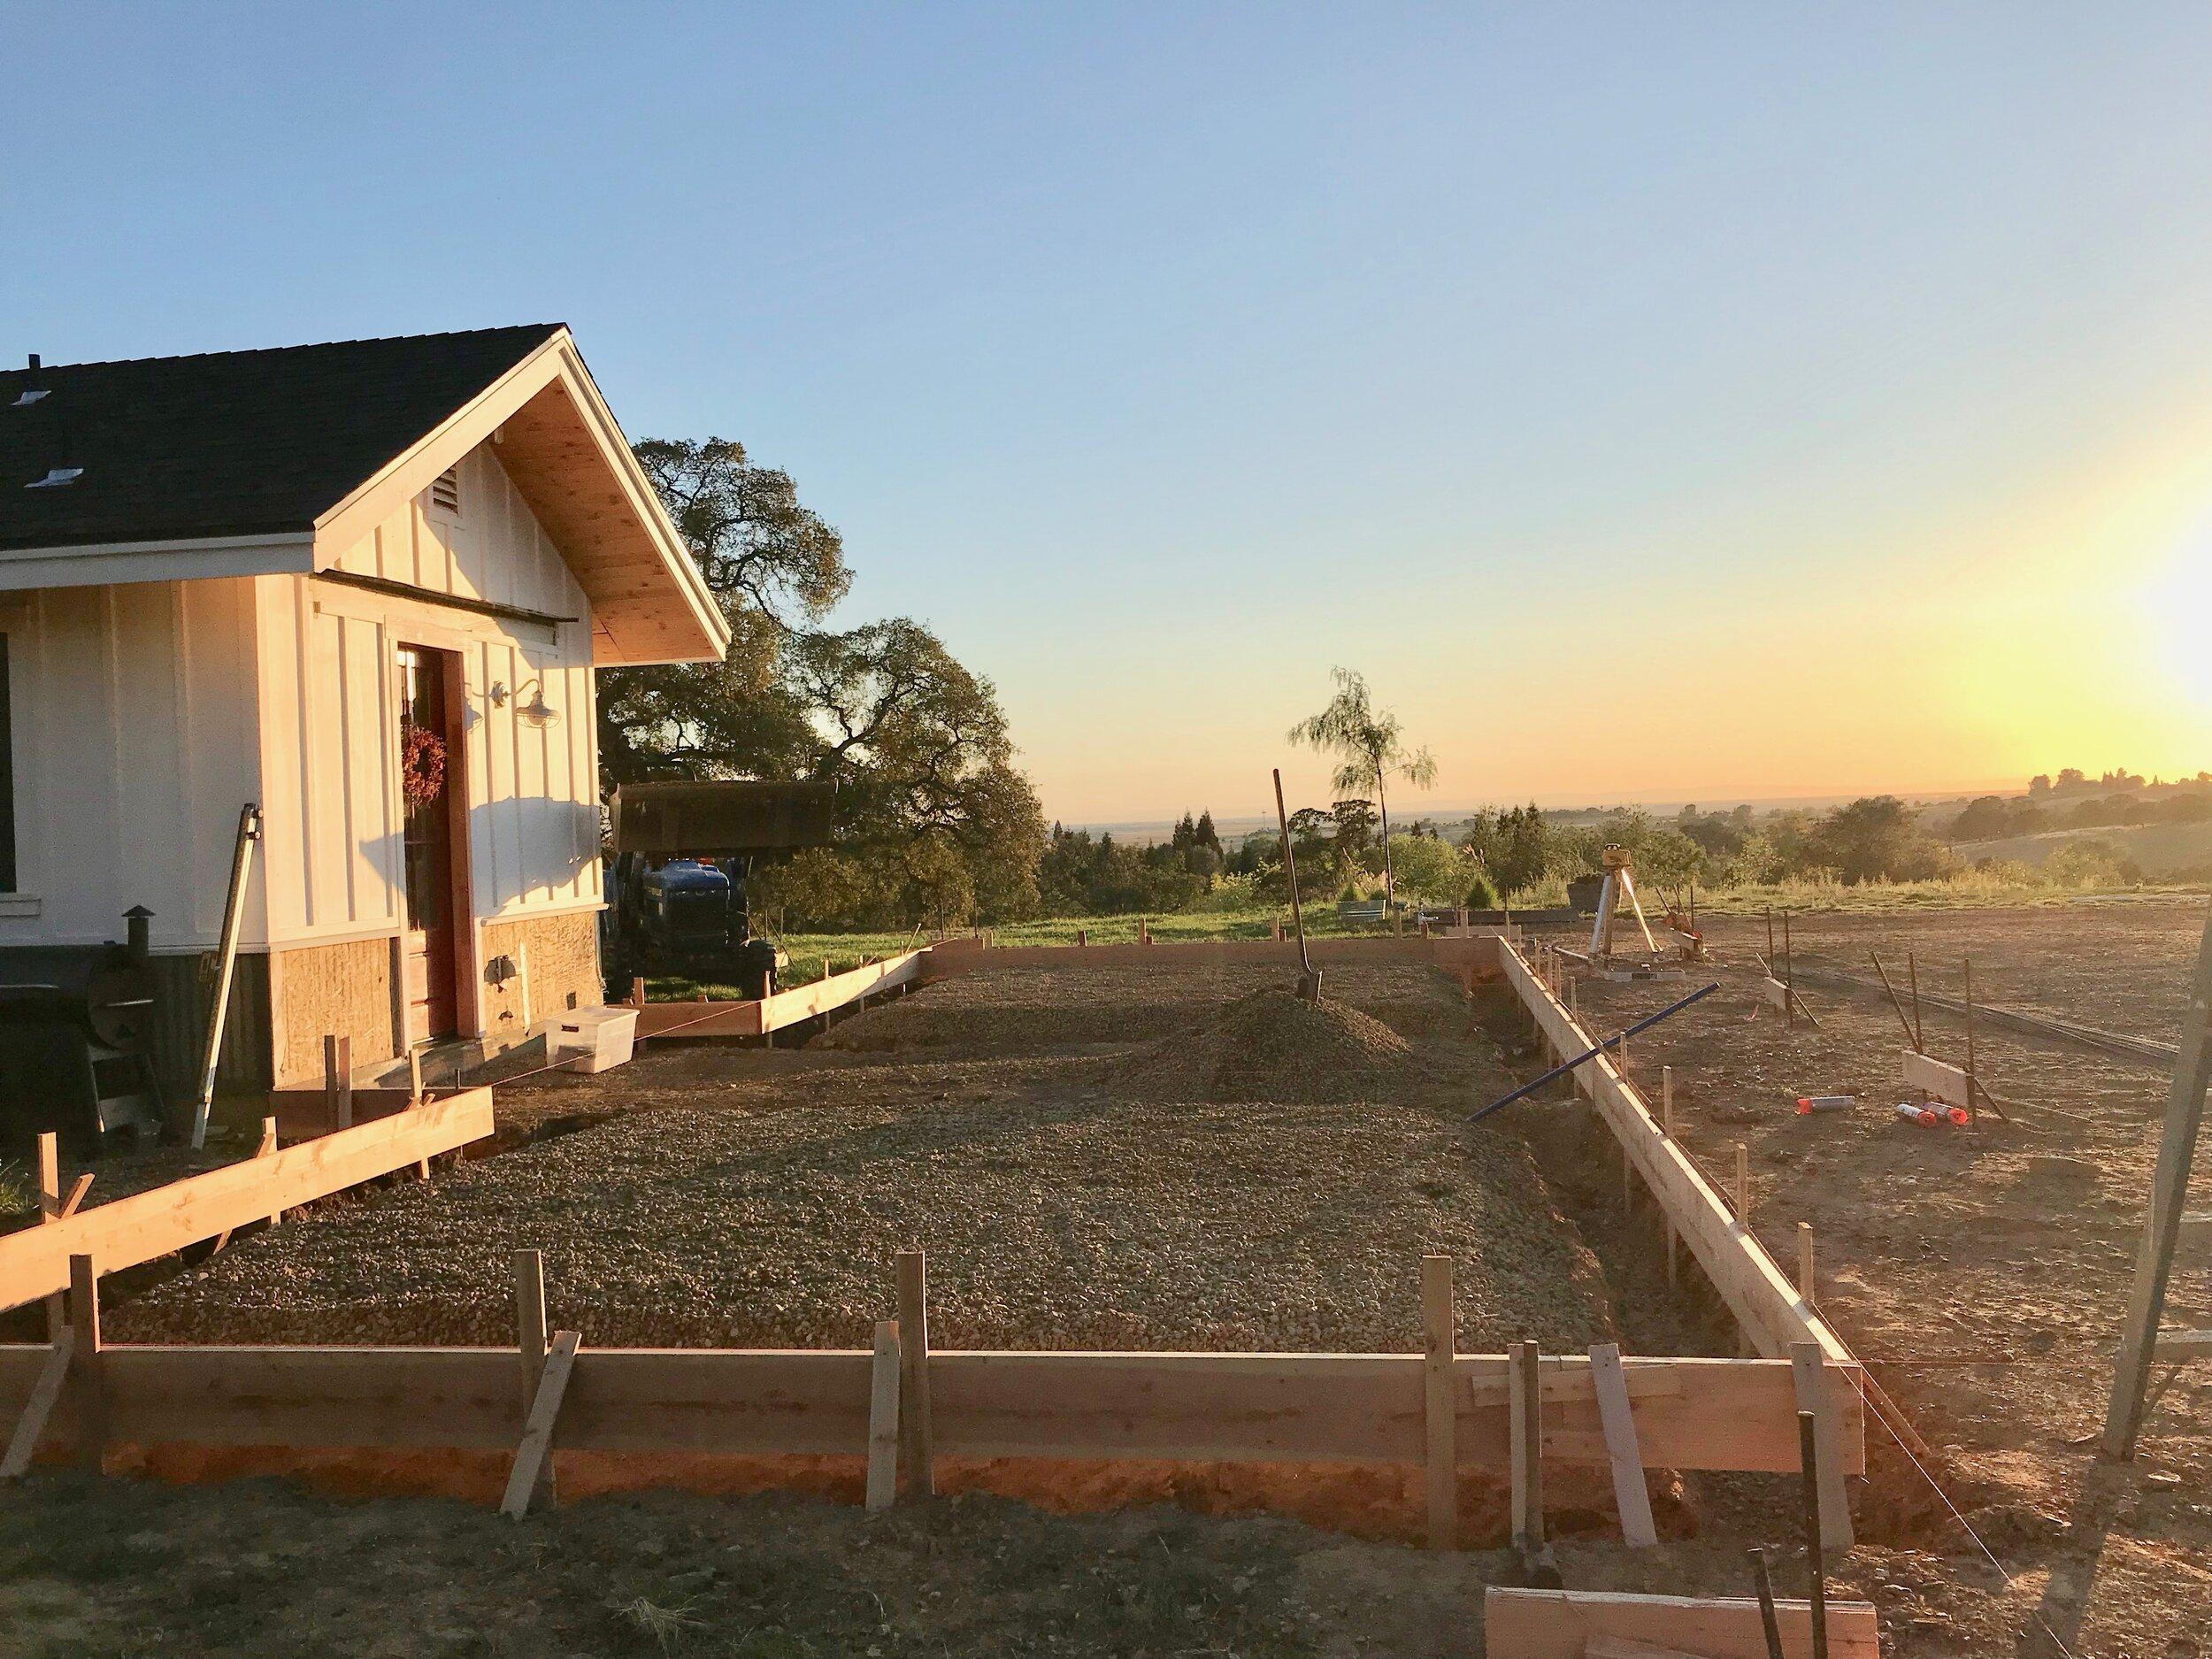 Home Building #farmhouse, #modernhouse, #diy, #diyconstruction, #homesteading, #homeviews, #whitefarmhouse, #farmhouselove, #fixerupper, #diy #diyhomeprojects, #diyhomedecor, #diyfarmhouse #homebuild, #homebuilder, #farmhouseview #farmhousegoals #homebuilding, #construction, #modernfarmhouse, #building, #dreamhome, #diyhome, #renovation, #concrete, #customhome, #architecturelovers, #homedepot, #homeimprovement, #instahome, #dreamhome